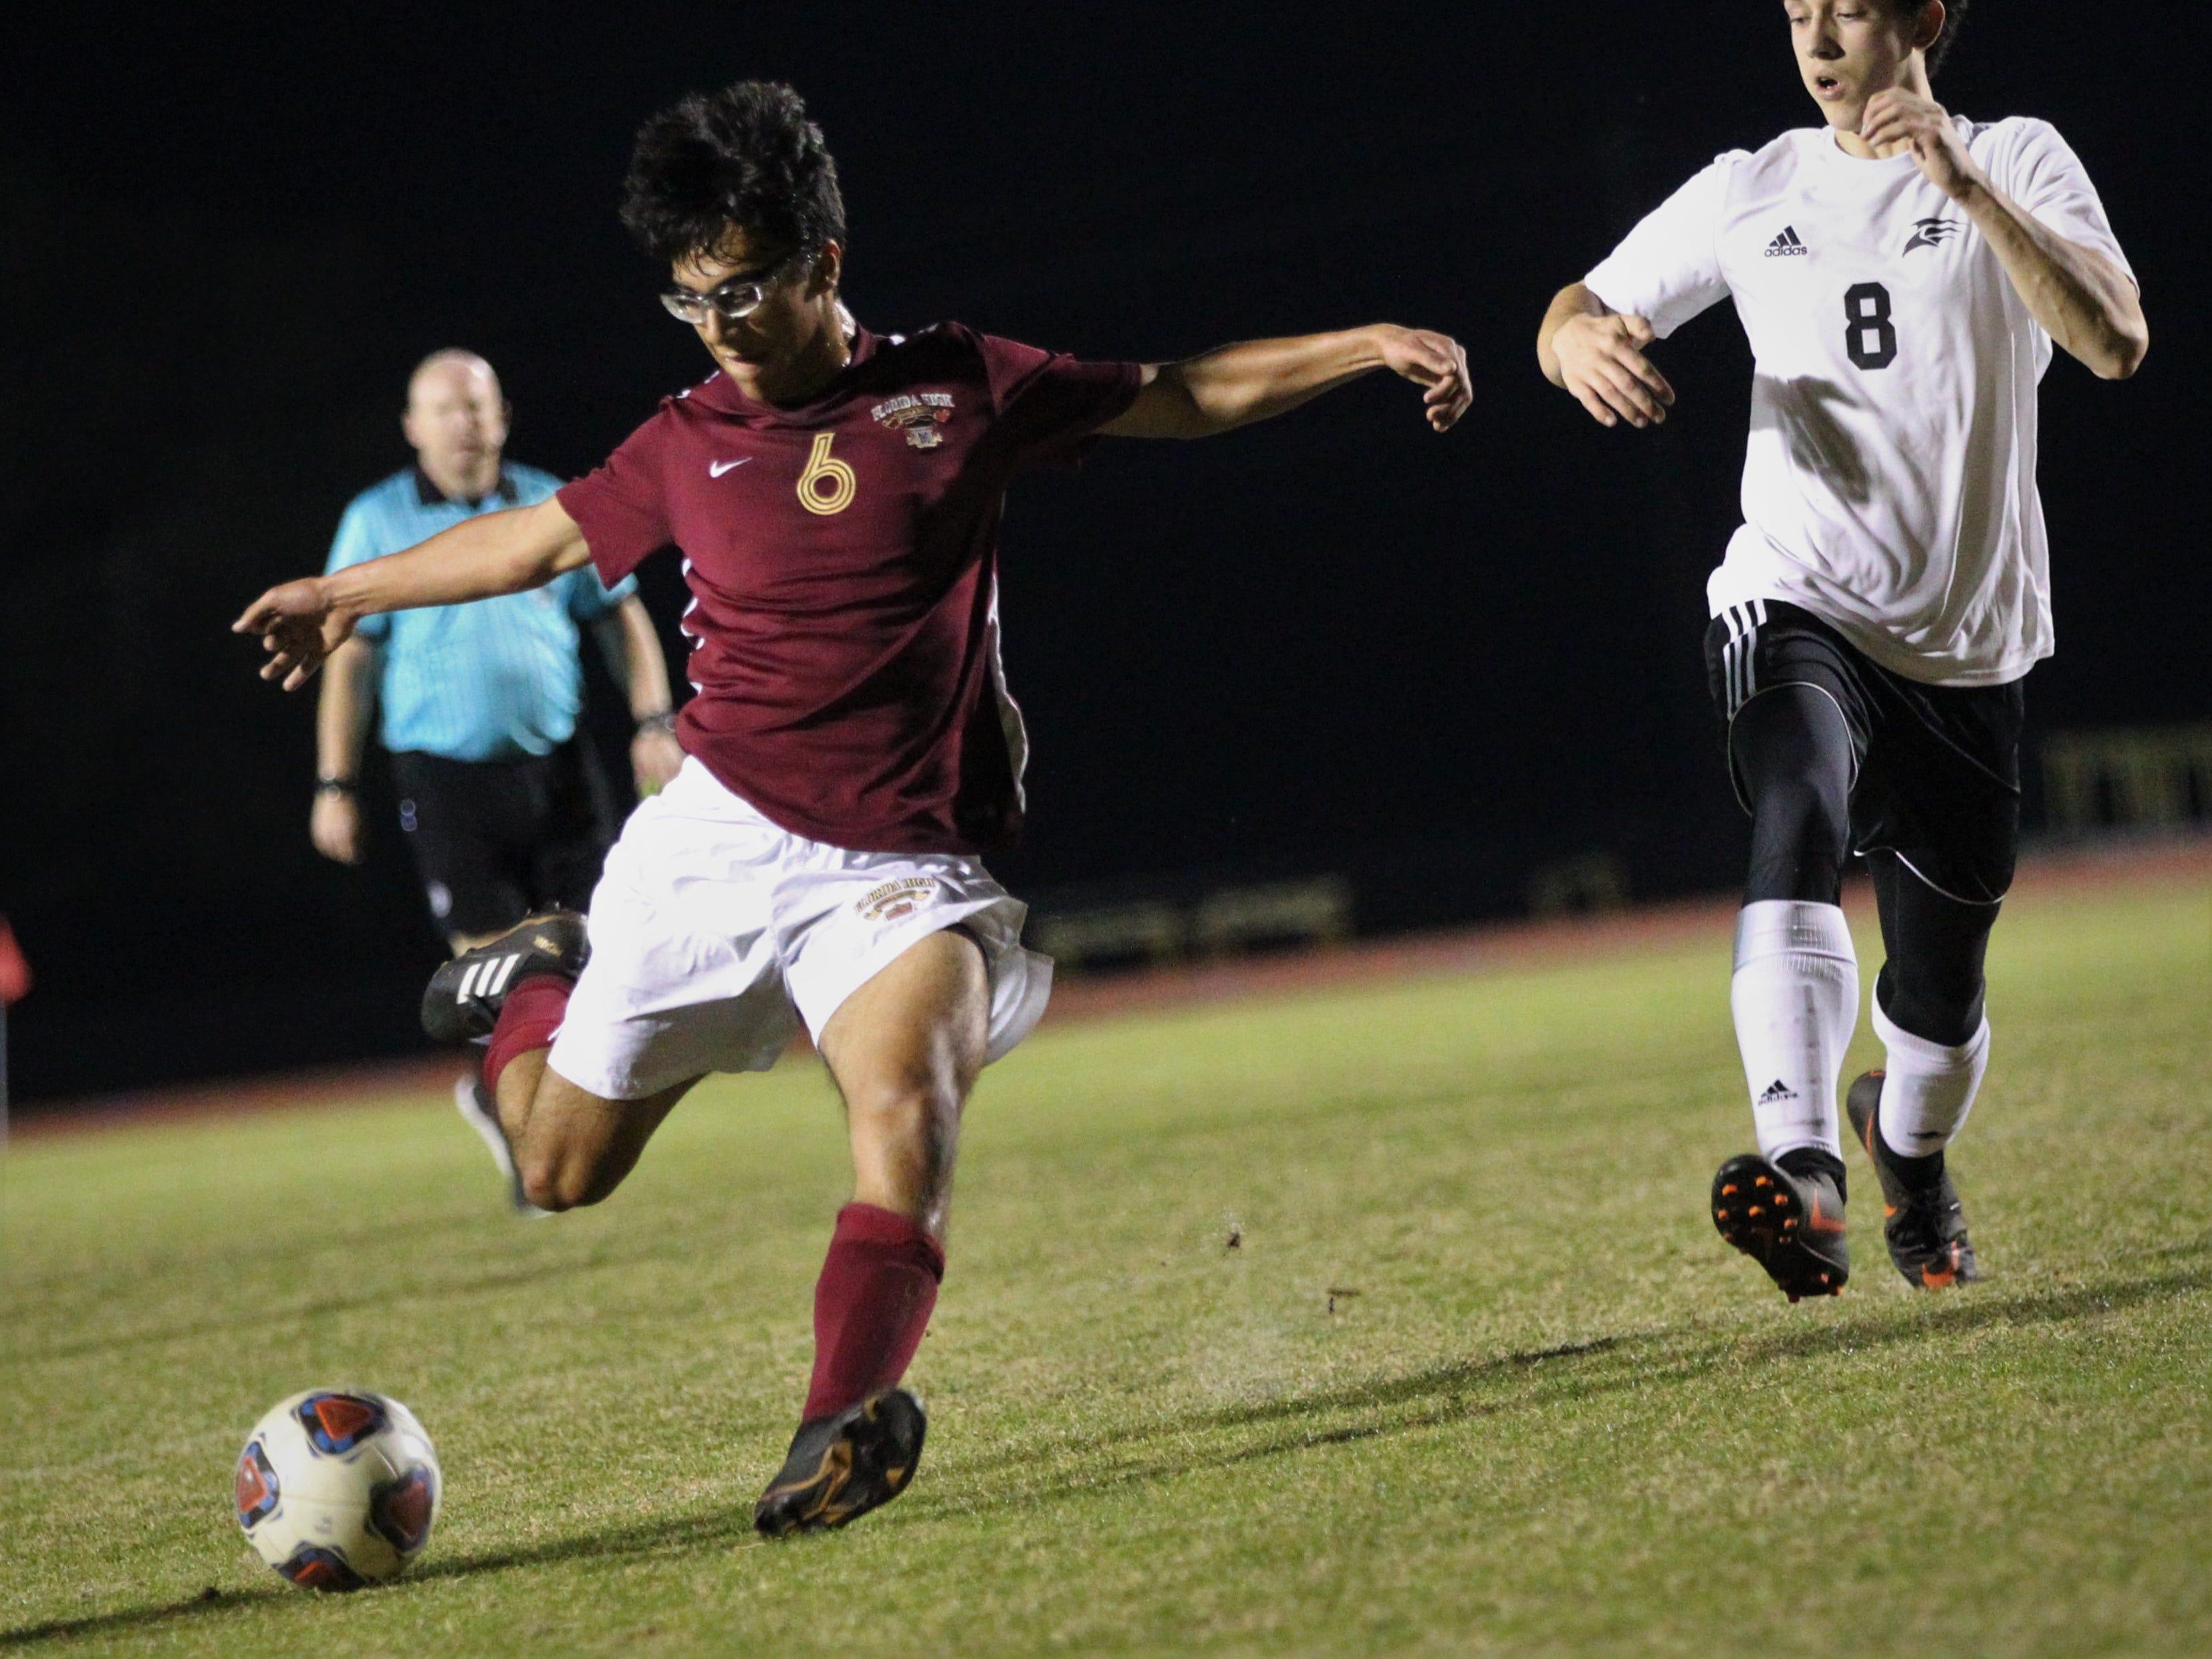 Florida High's Justin Garcia takes a shot on goal as Florida High's boys soccer team beat South Walton 2-0 during a Region 1-2A quarterfinal on Feb. 6, 2018.